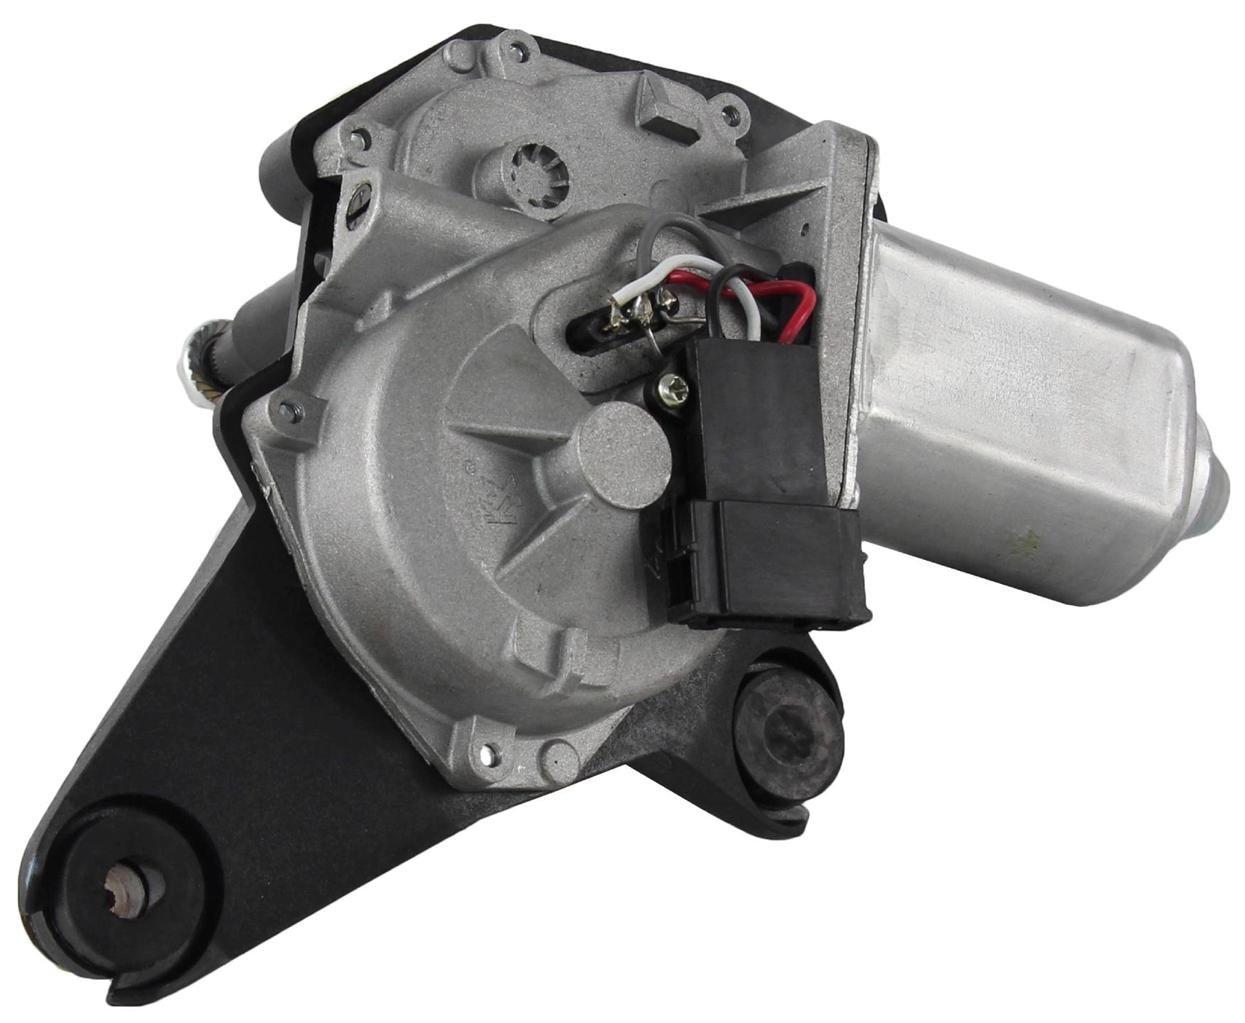 REAR WIPER MOTOR MERCEDES BENZ 07-09 ML320 06-12 ML350 10-11 ML450 06-07 ML500